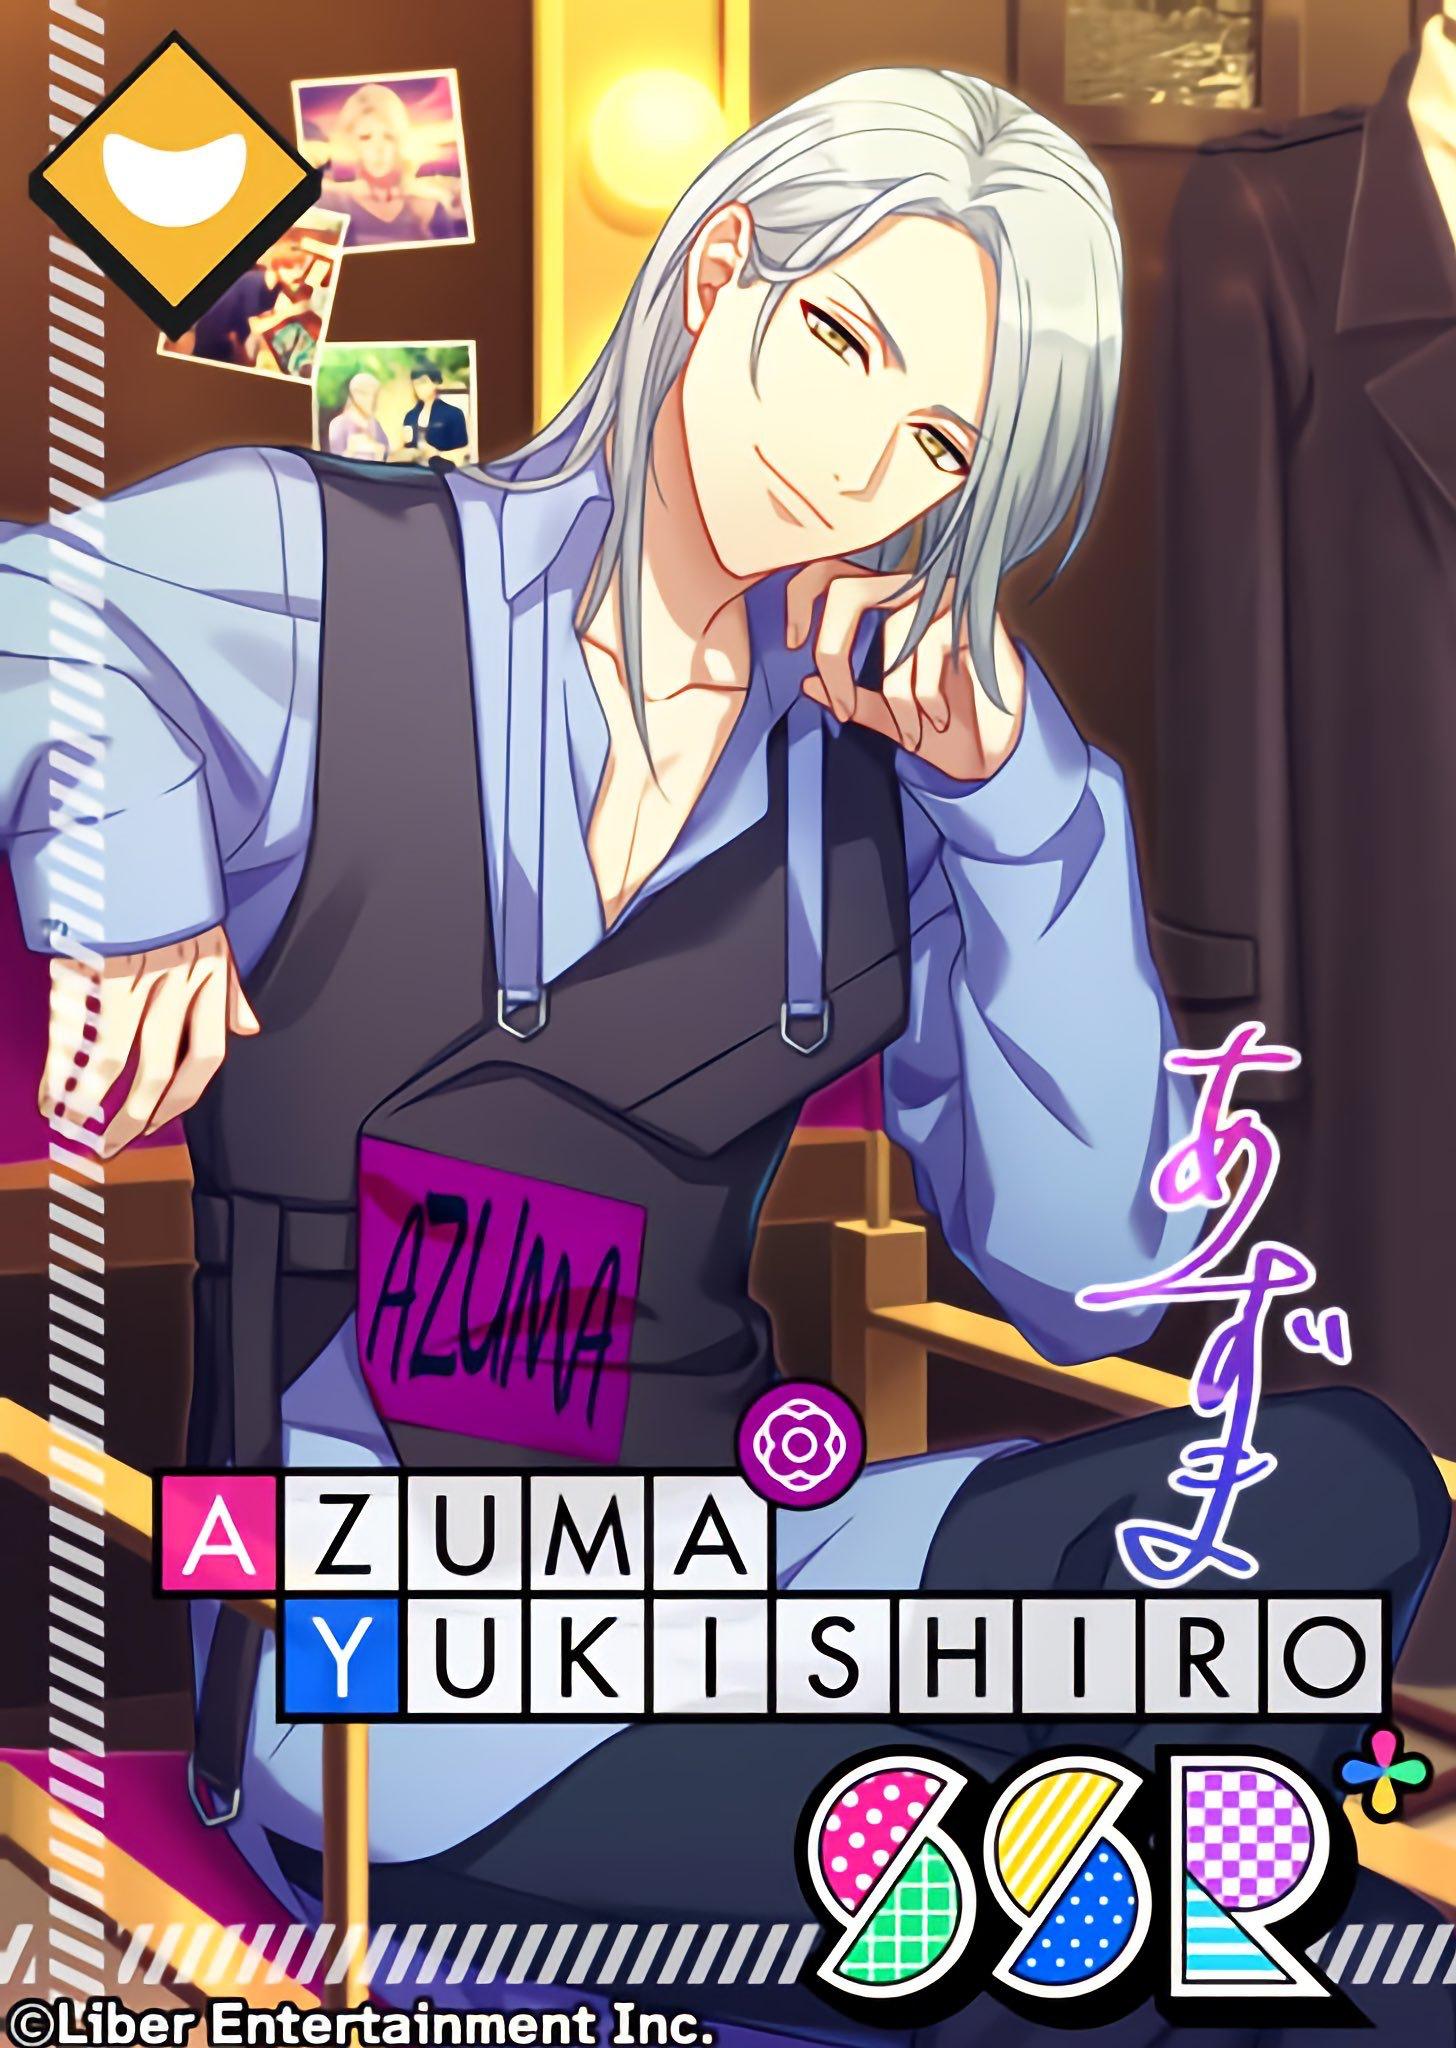 Azuma Yukishiro In 2020 Hot Anime Guys Romantic Anime Anime Boy